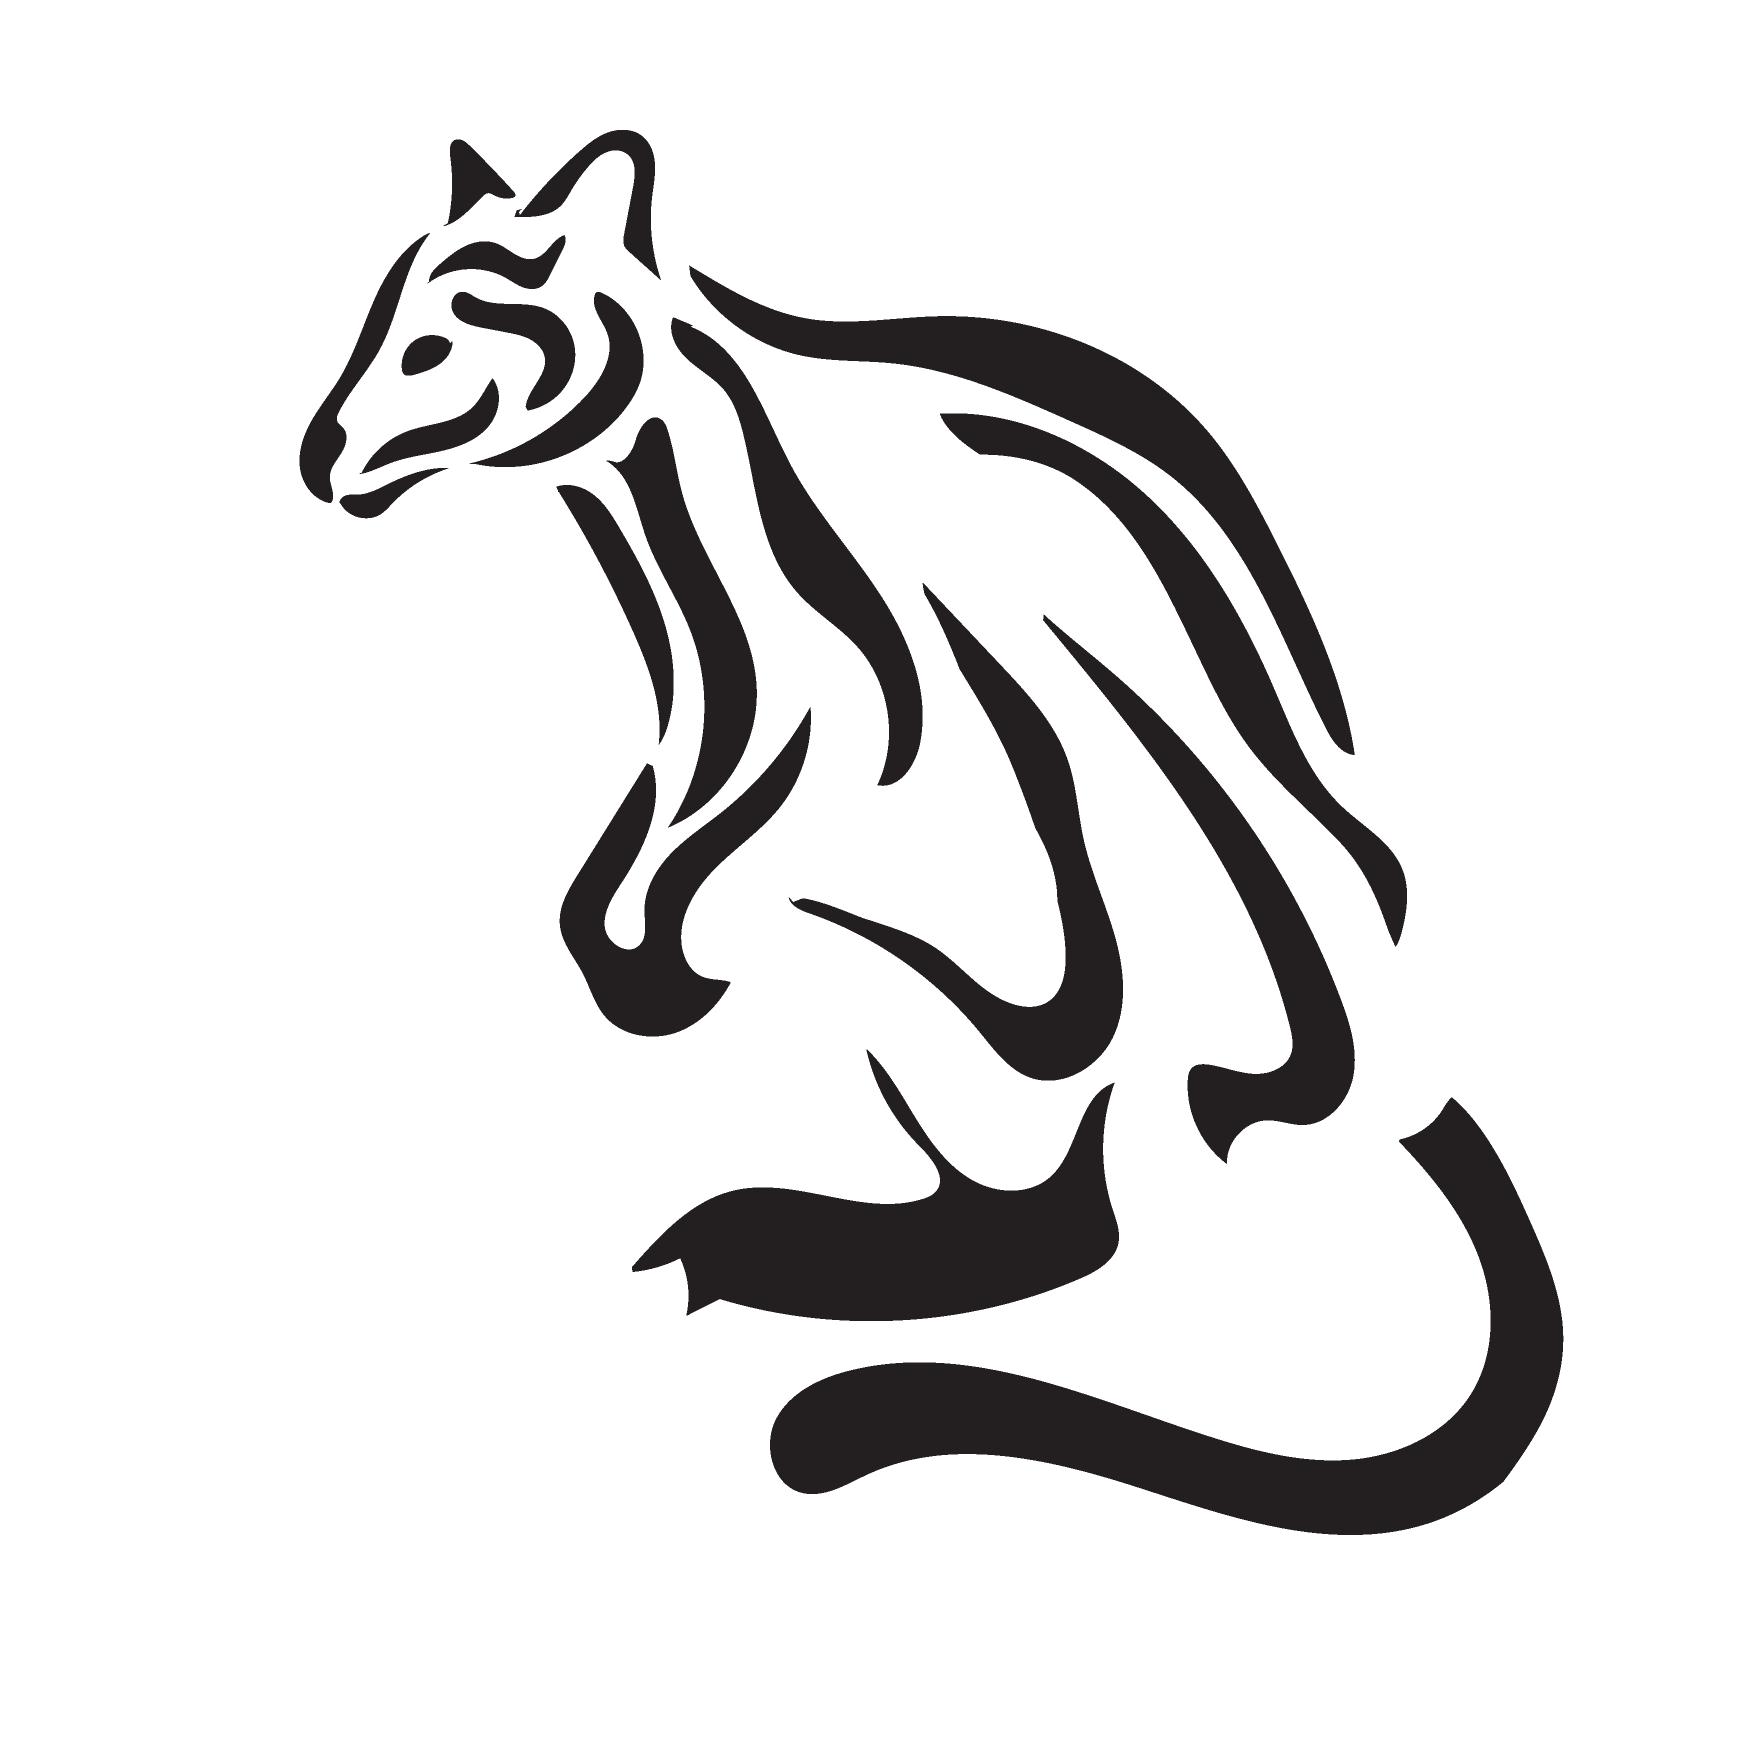 Endangered animals jose diaz. Kangaroo clipart stencil